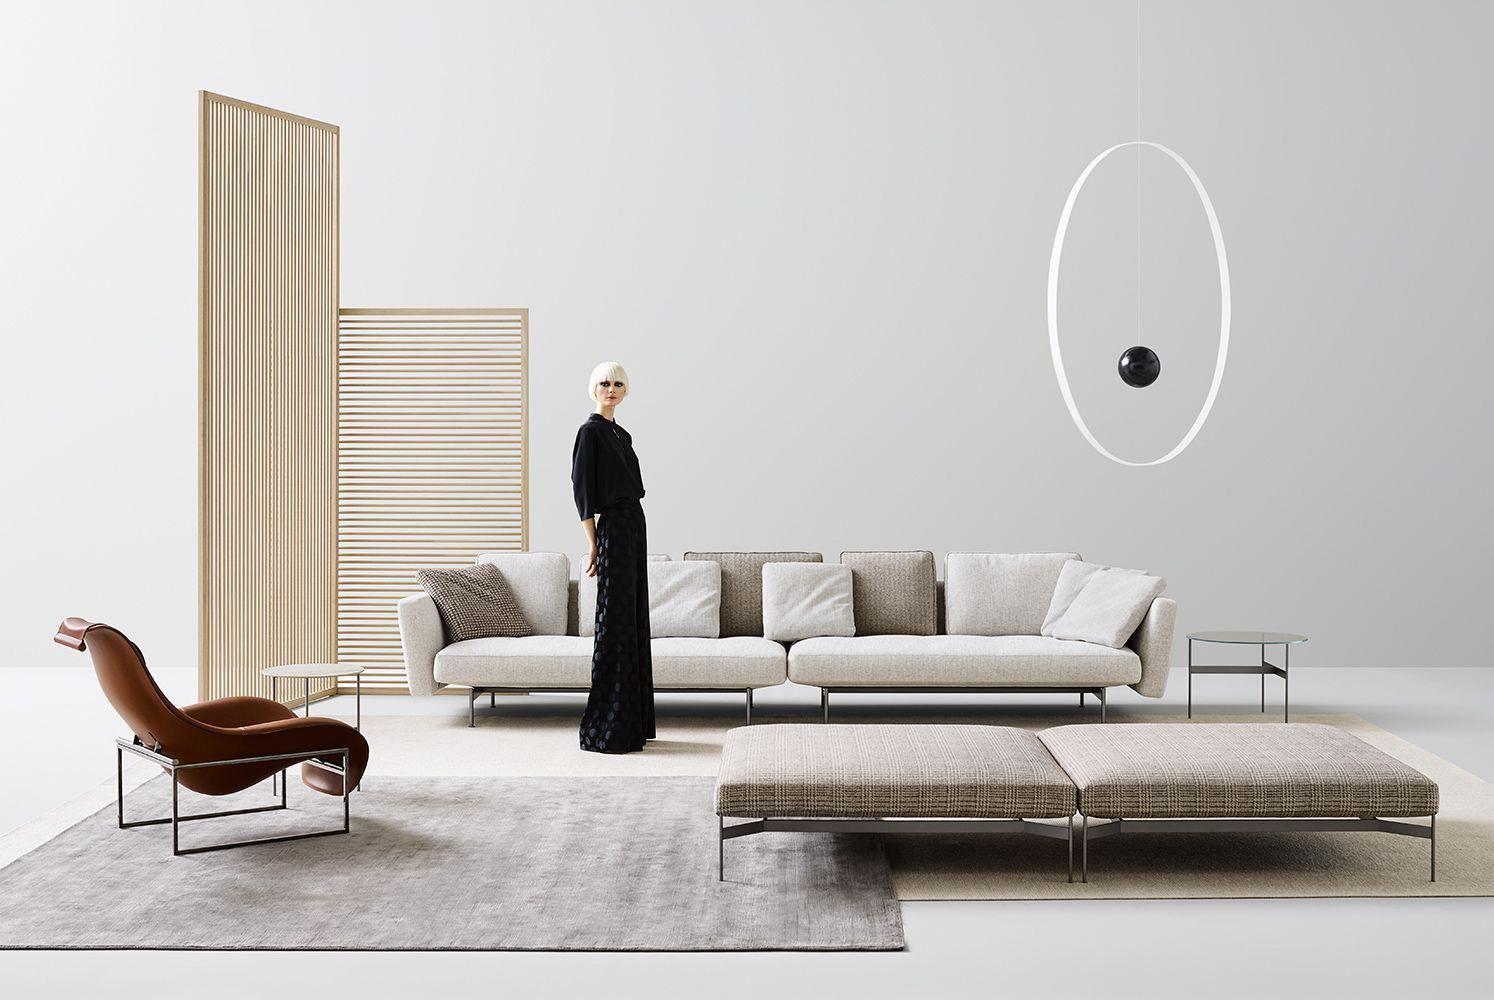 SillonesModernos   Living room design modern, Elle decor living ...